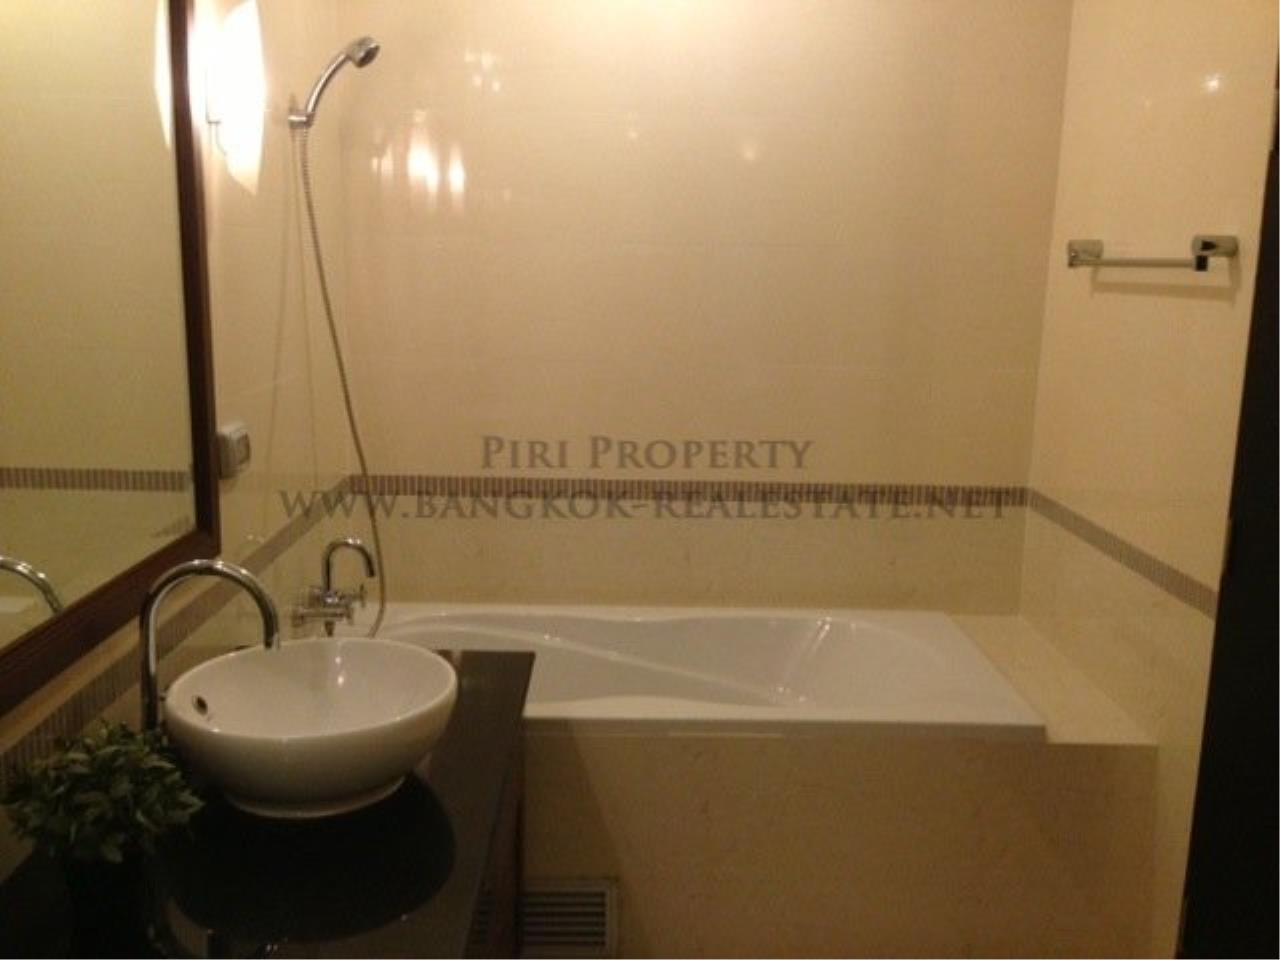 Piri Property Agency's Nice 1 Bedroom Condo near Ratchtewi BTS Station - 58 SQM - 30K 10